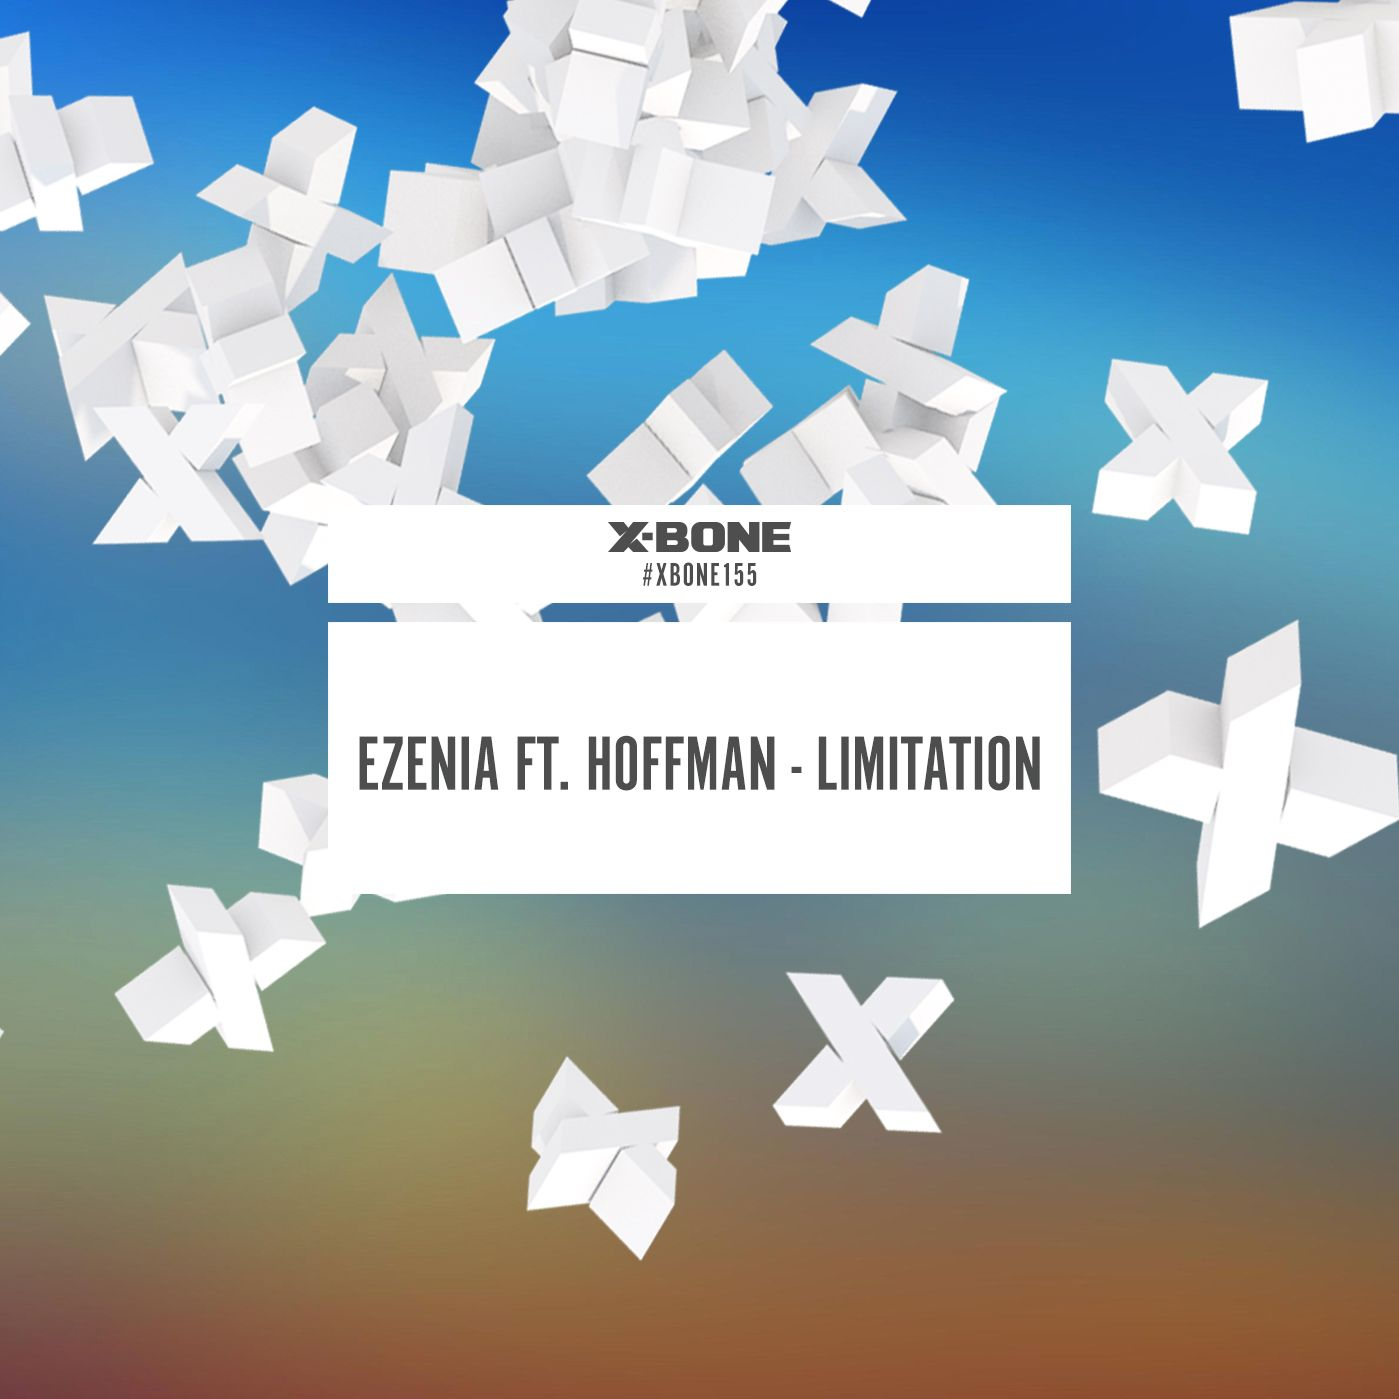 Ezenia Ft. Hoffman - Limitation [X-BONE RECORDS] XBONE155